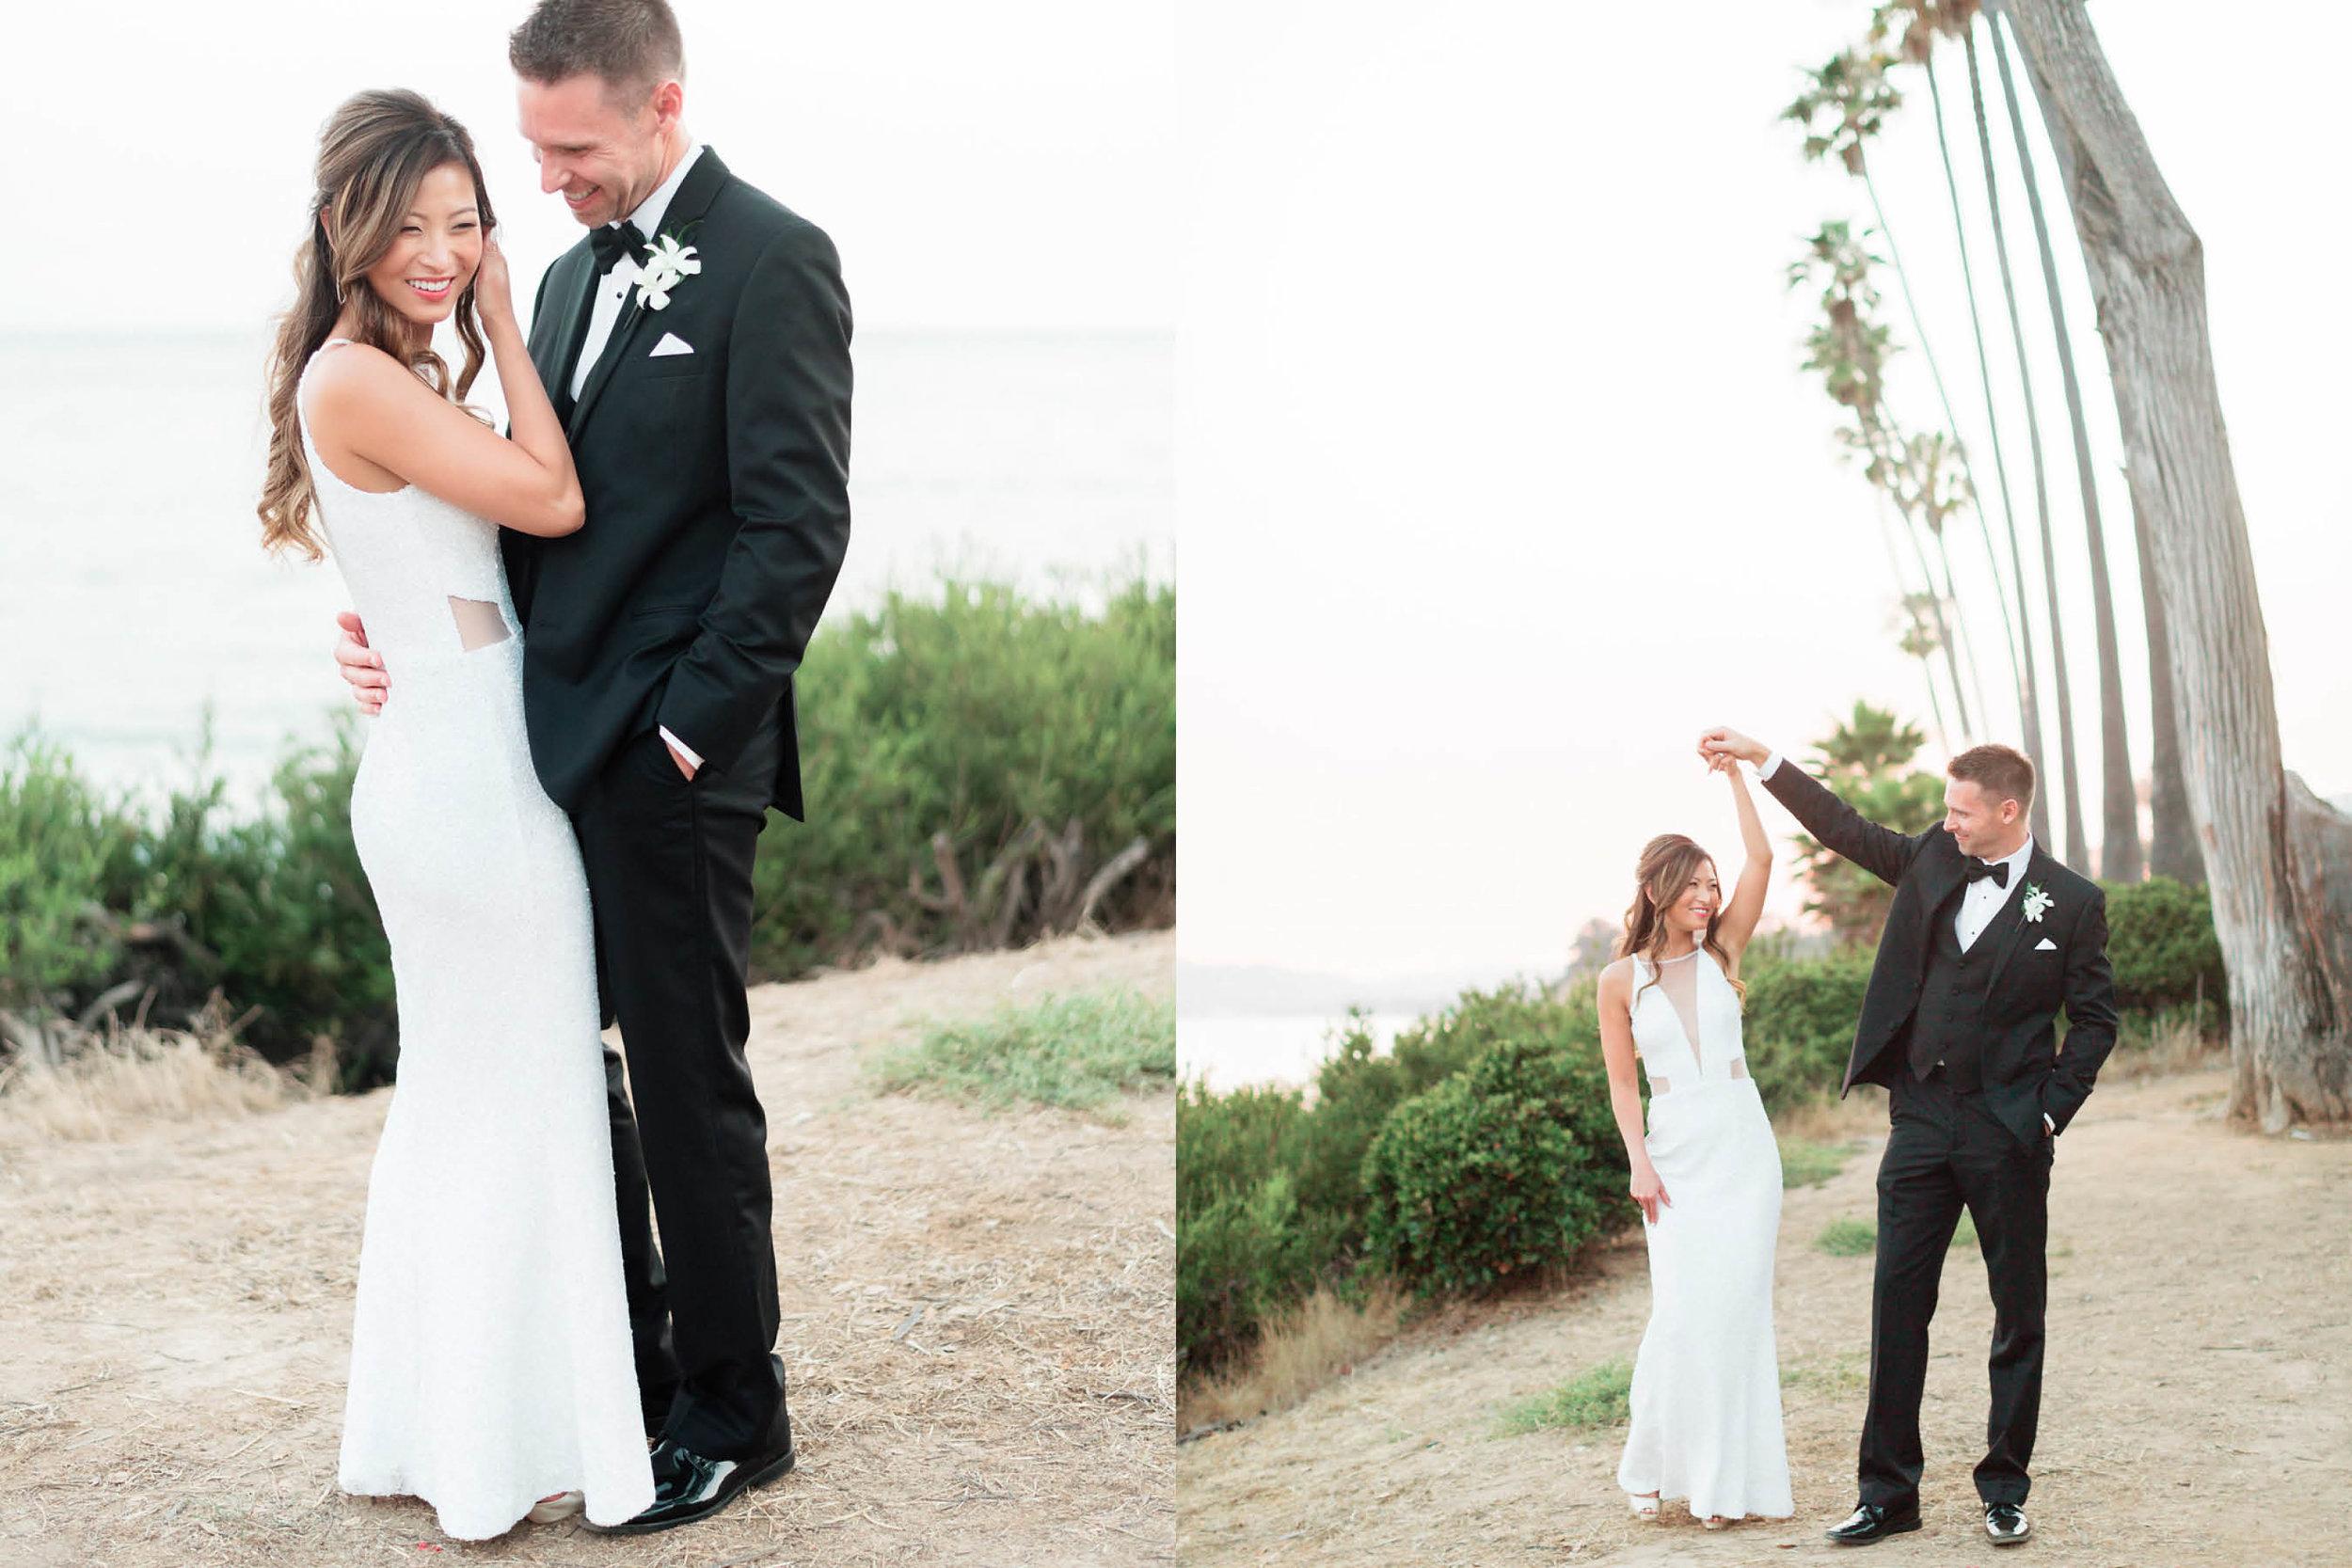 santa-barbara-elopement-elope-wedding-planner-coordinator-day-of-four-seasons-biltmore-ocean-front-view-garden-pink-white-green-montecito-black-tie (23).jpg